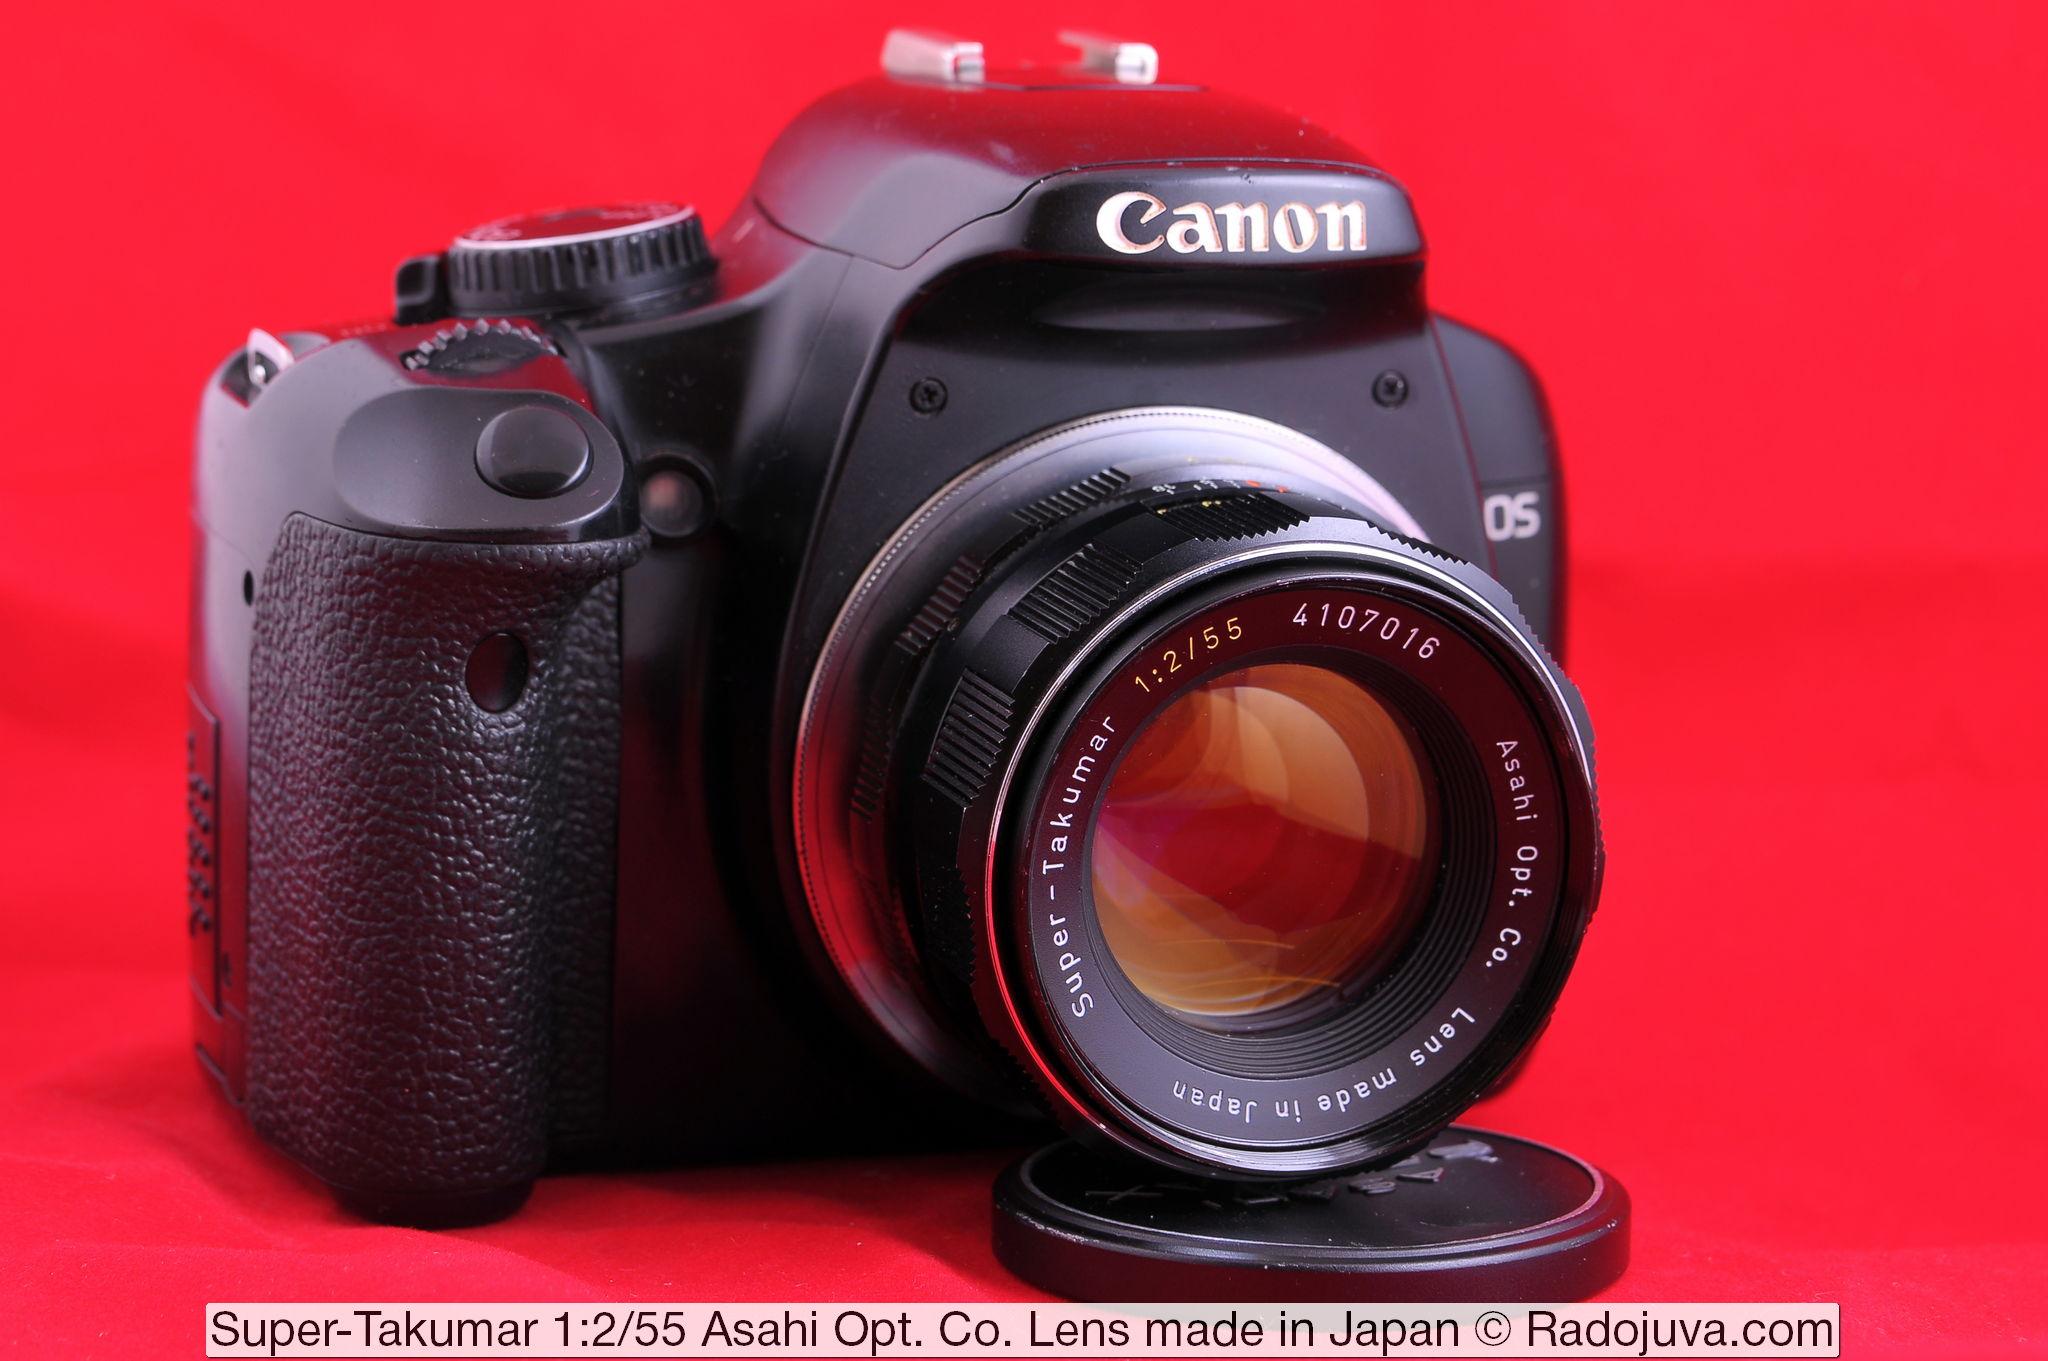 Super-Takumar 1:2/55 Asahi Opt. Co. Lens made in Japan